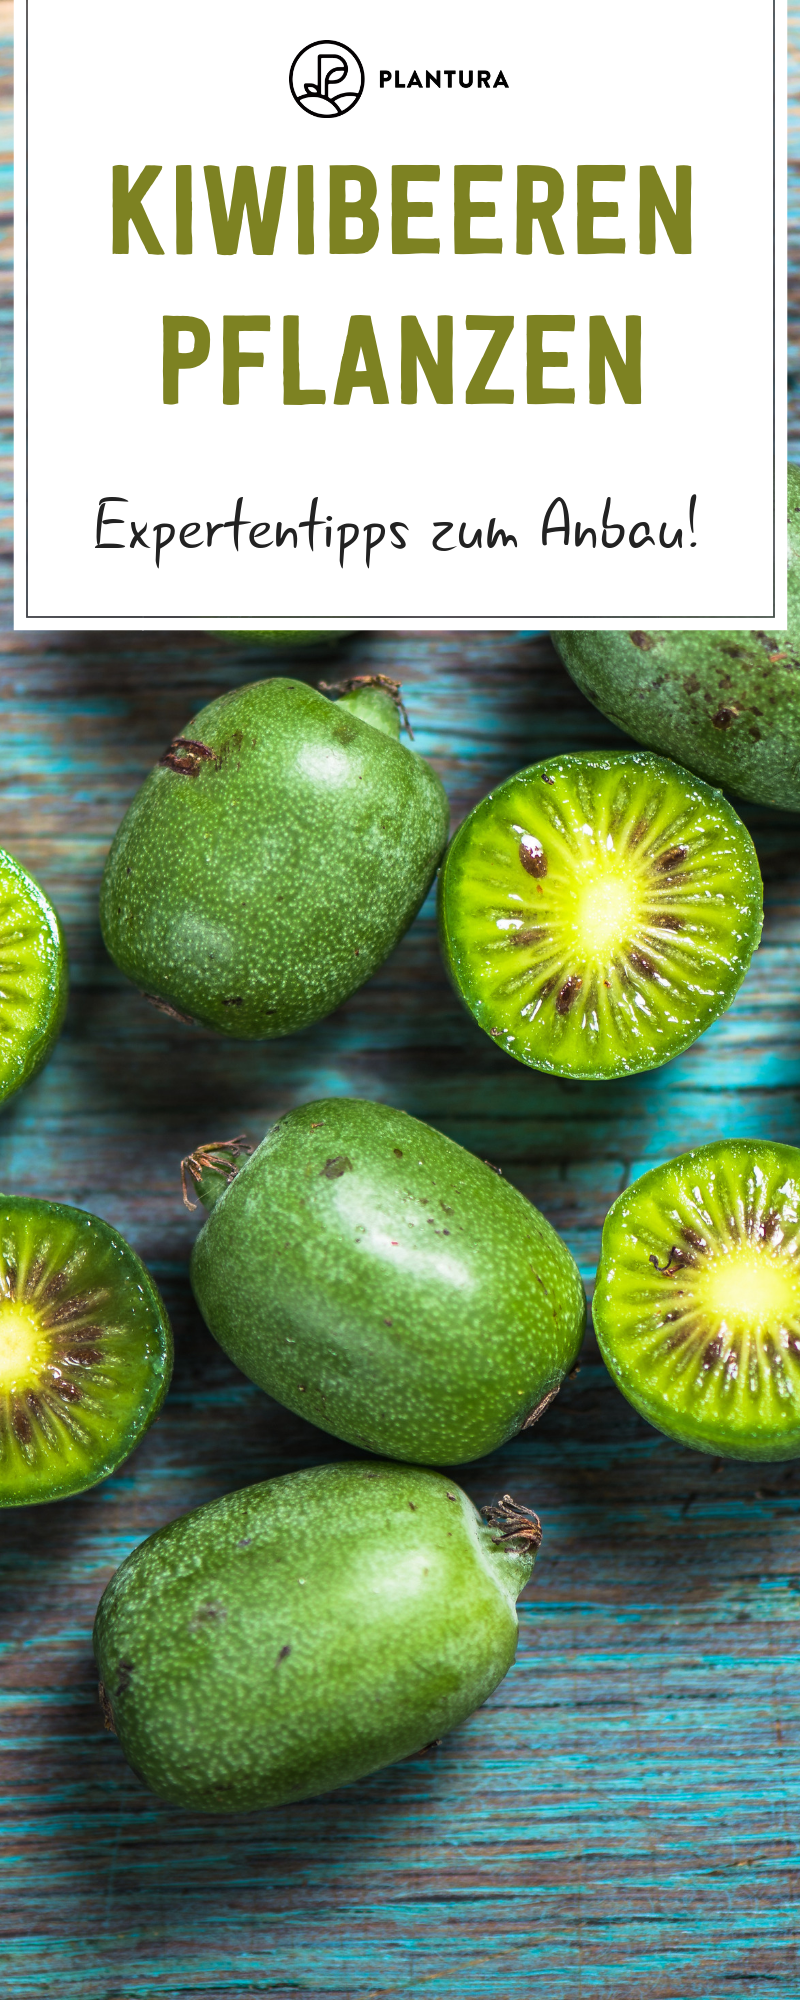 Planting kiwi berries tips for growing mini kiwiberries